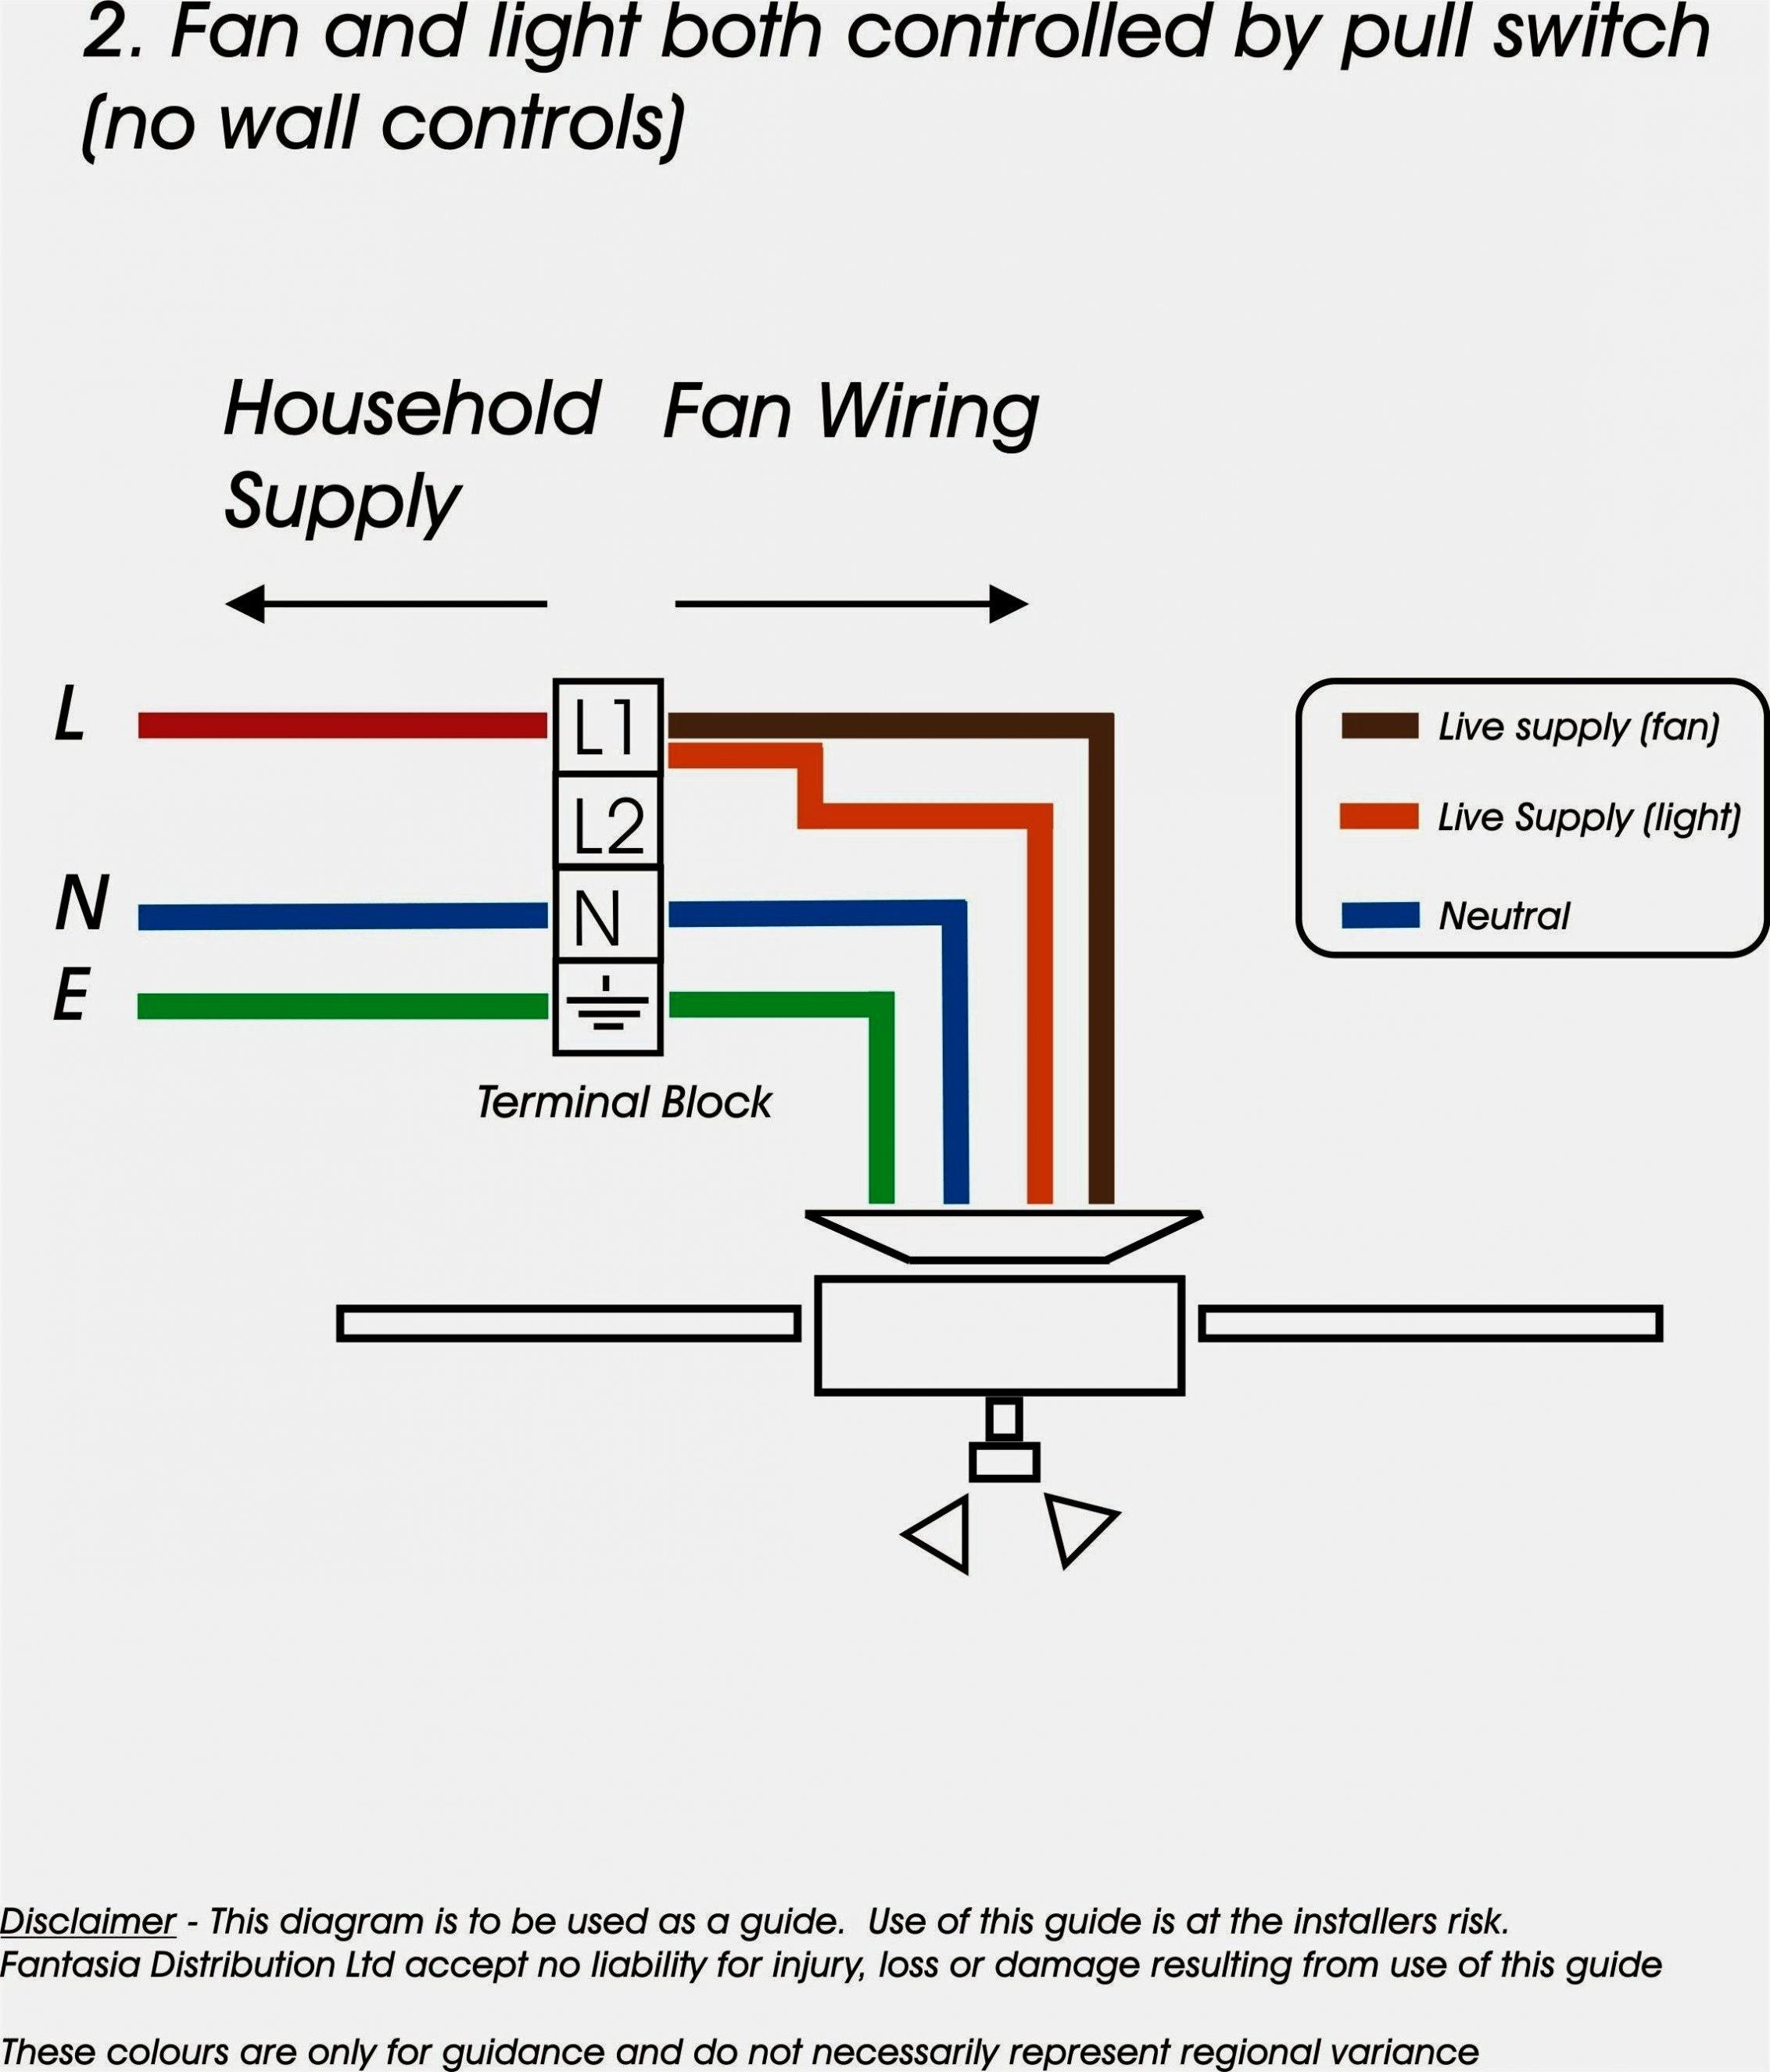 Fan Pull Chain Switch Wiring Diagram - All Wiring Diagram - 3 Speed Pull Chain Switch Wiring Diagram